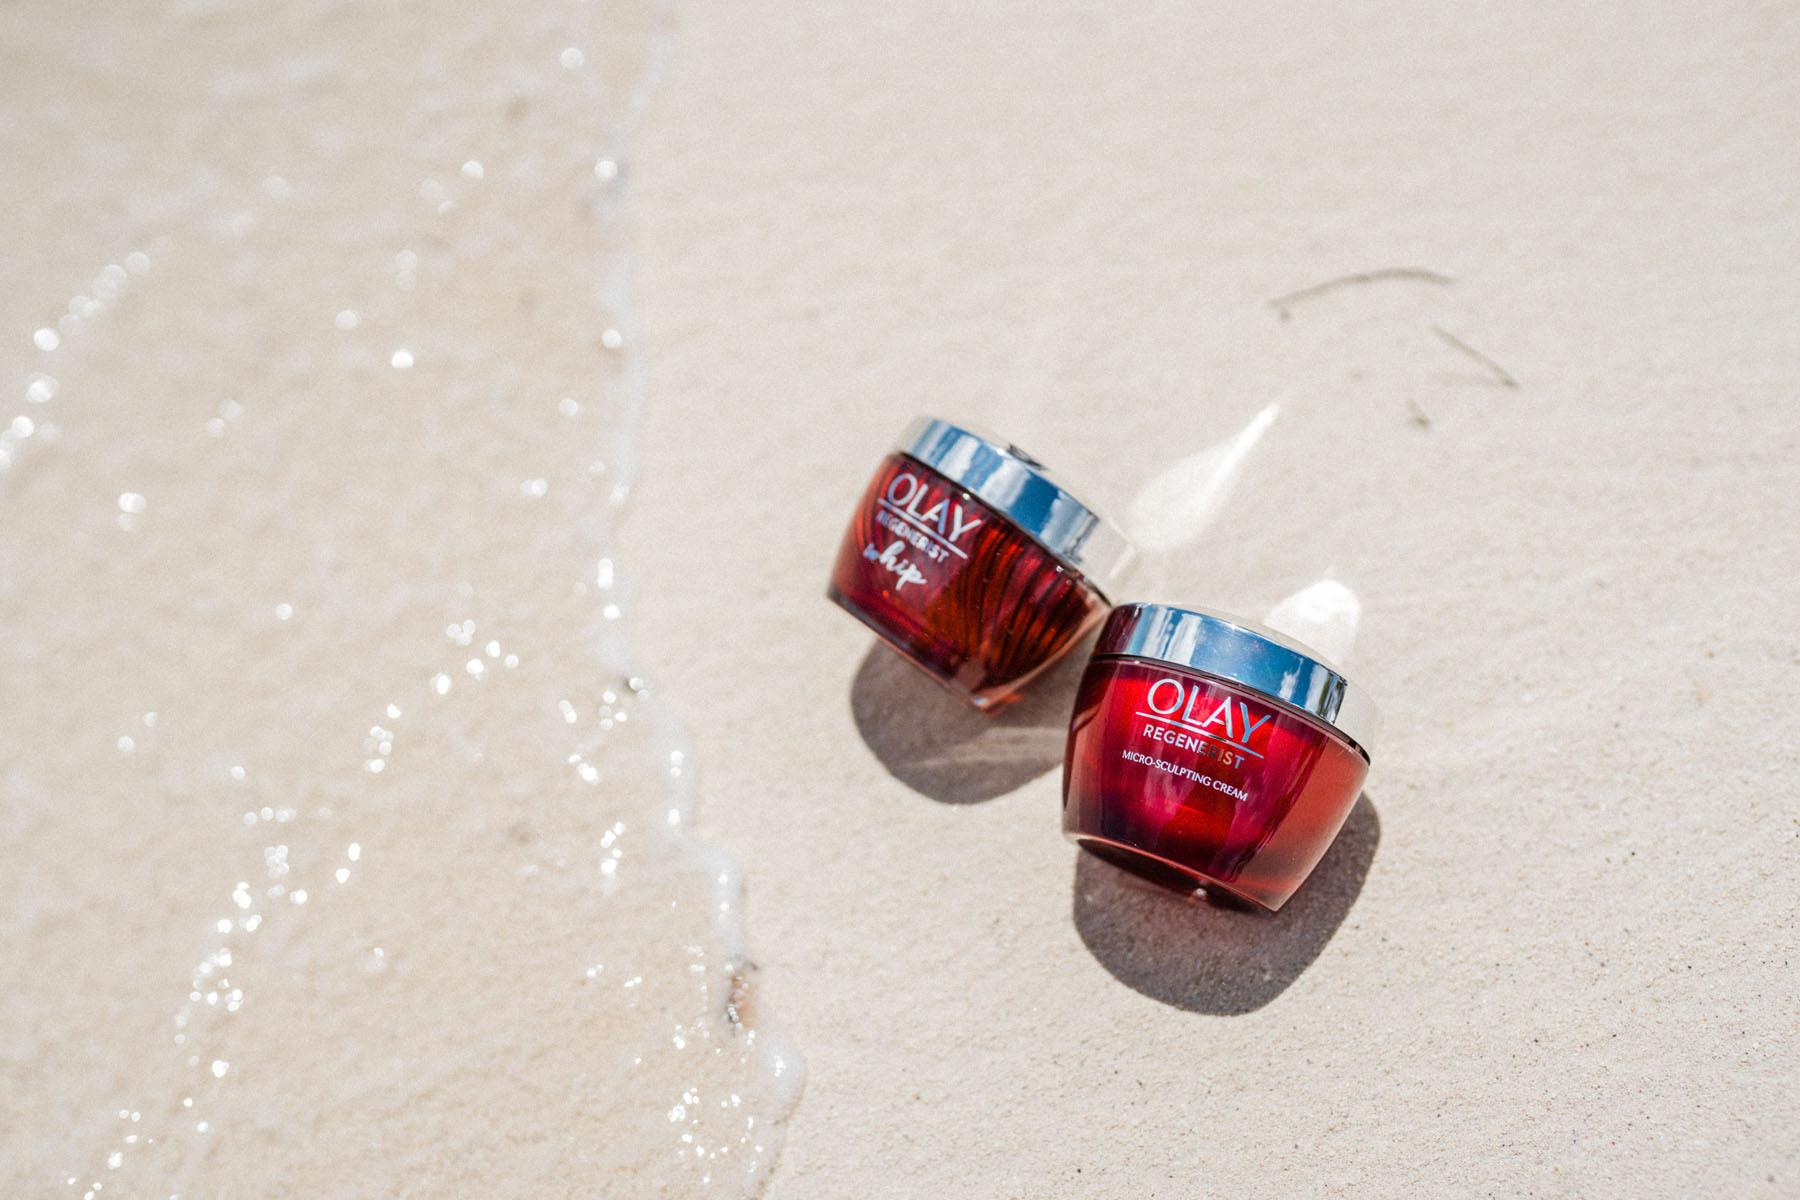 beach shore, olay regenerist whip, olay regenerist microsculpting cream, moisturizer // Notjessfashion.com